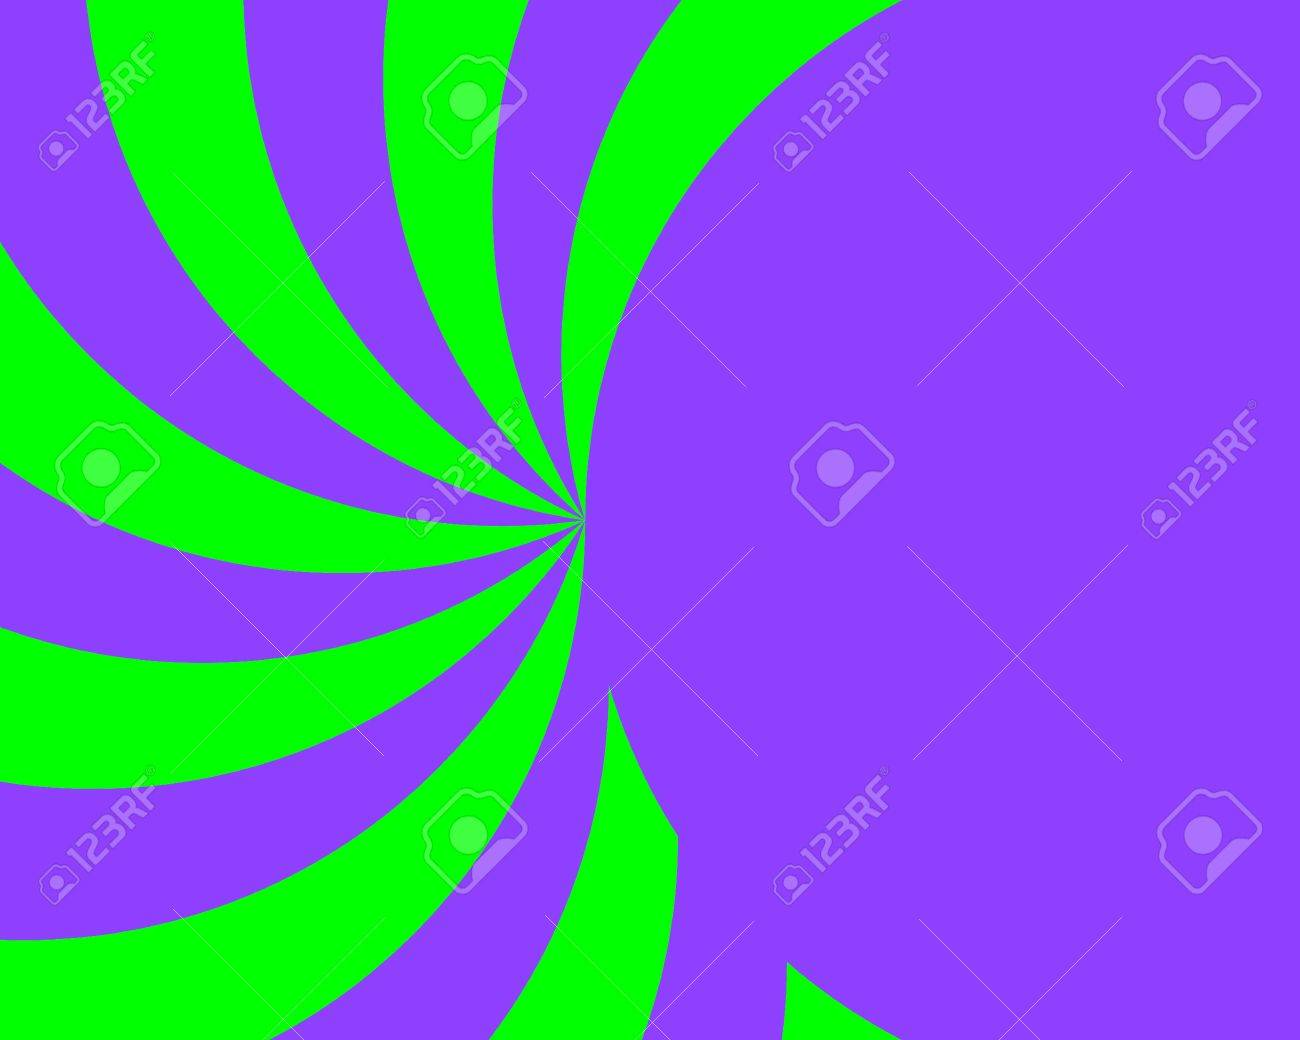 Luminoso Ray Viola E Verde E Circle Sfondo Metà